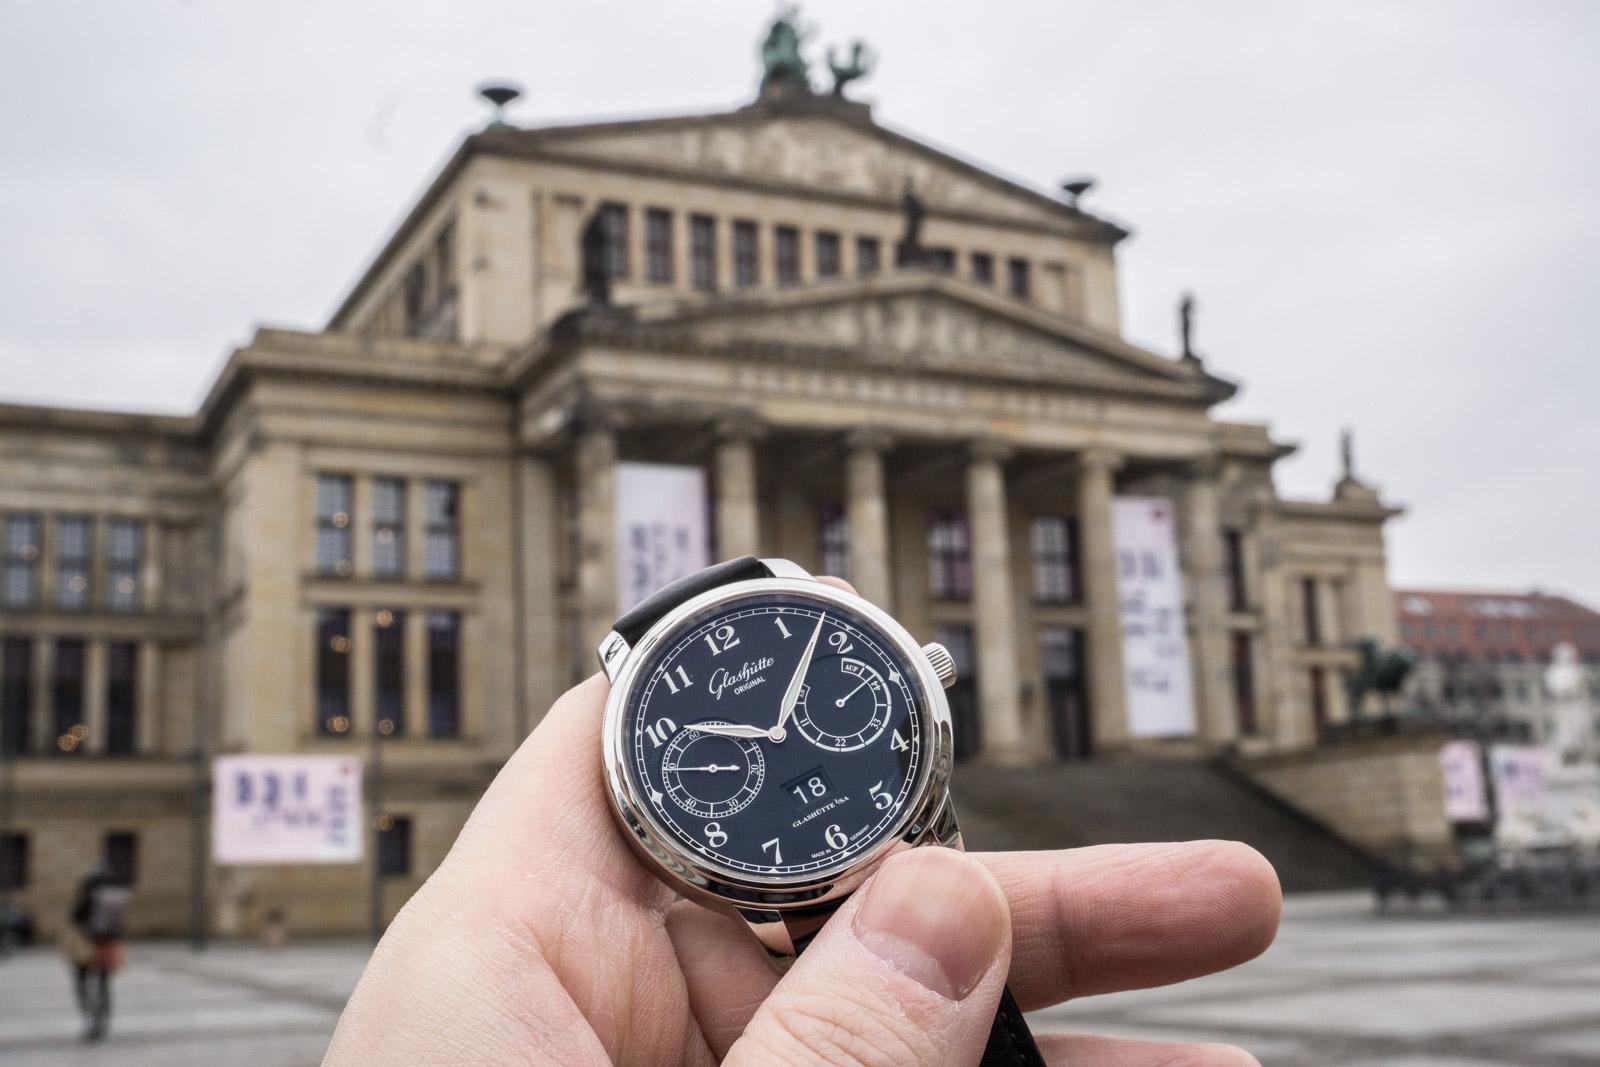 glashutte-original-senator-observer-berlin-8135